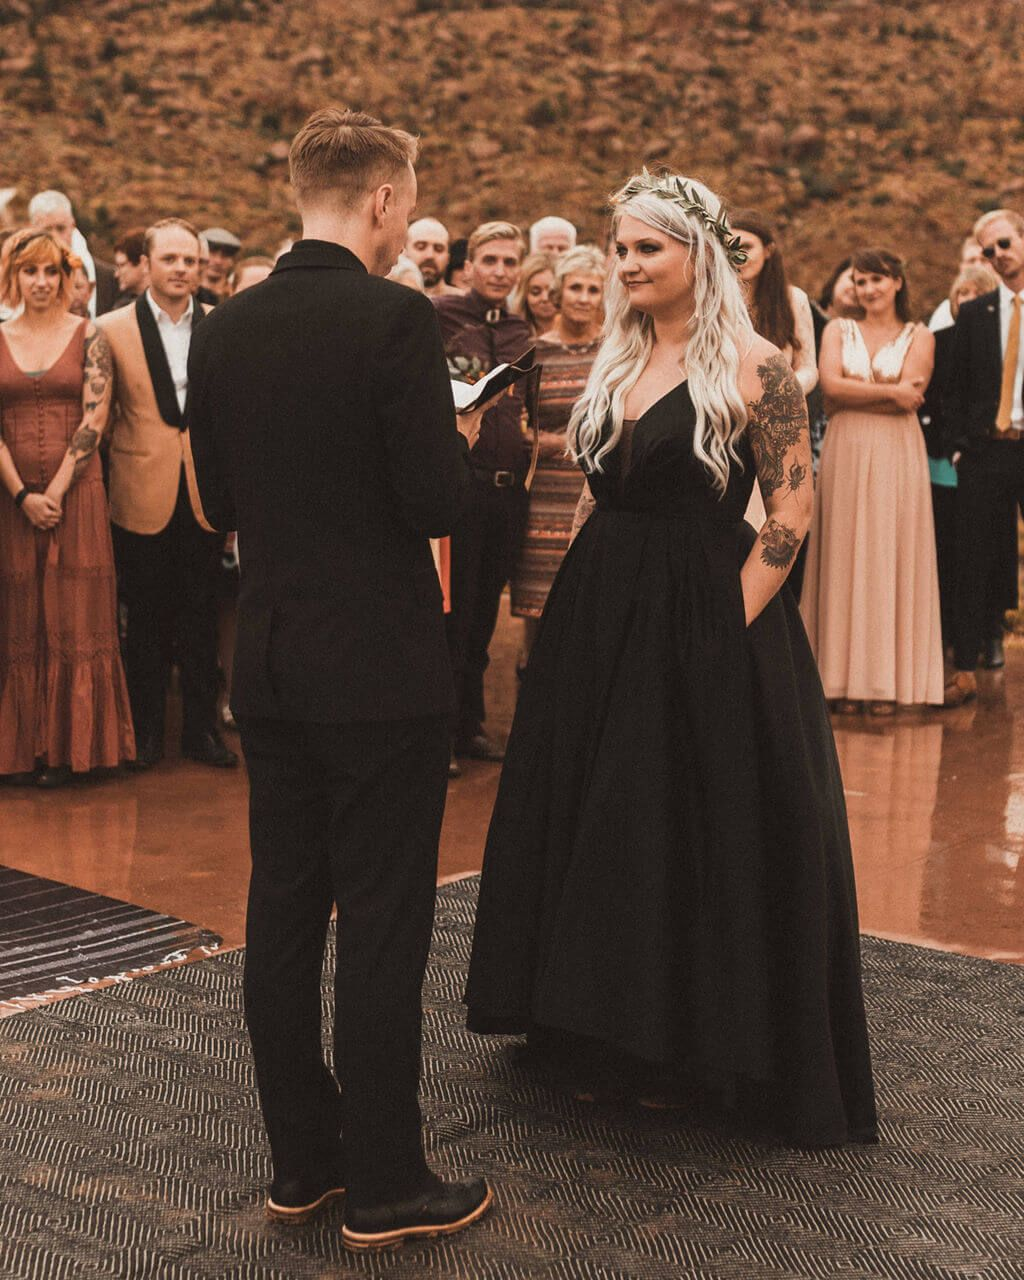 Black And Gold Tattooed Wedding In Zion Destination Wedding Planner Boho Wedding Dress Festival Style Wedding Boho Wedding Gowns